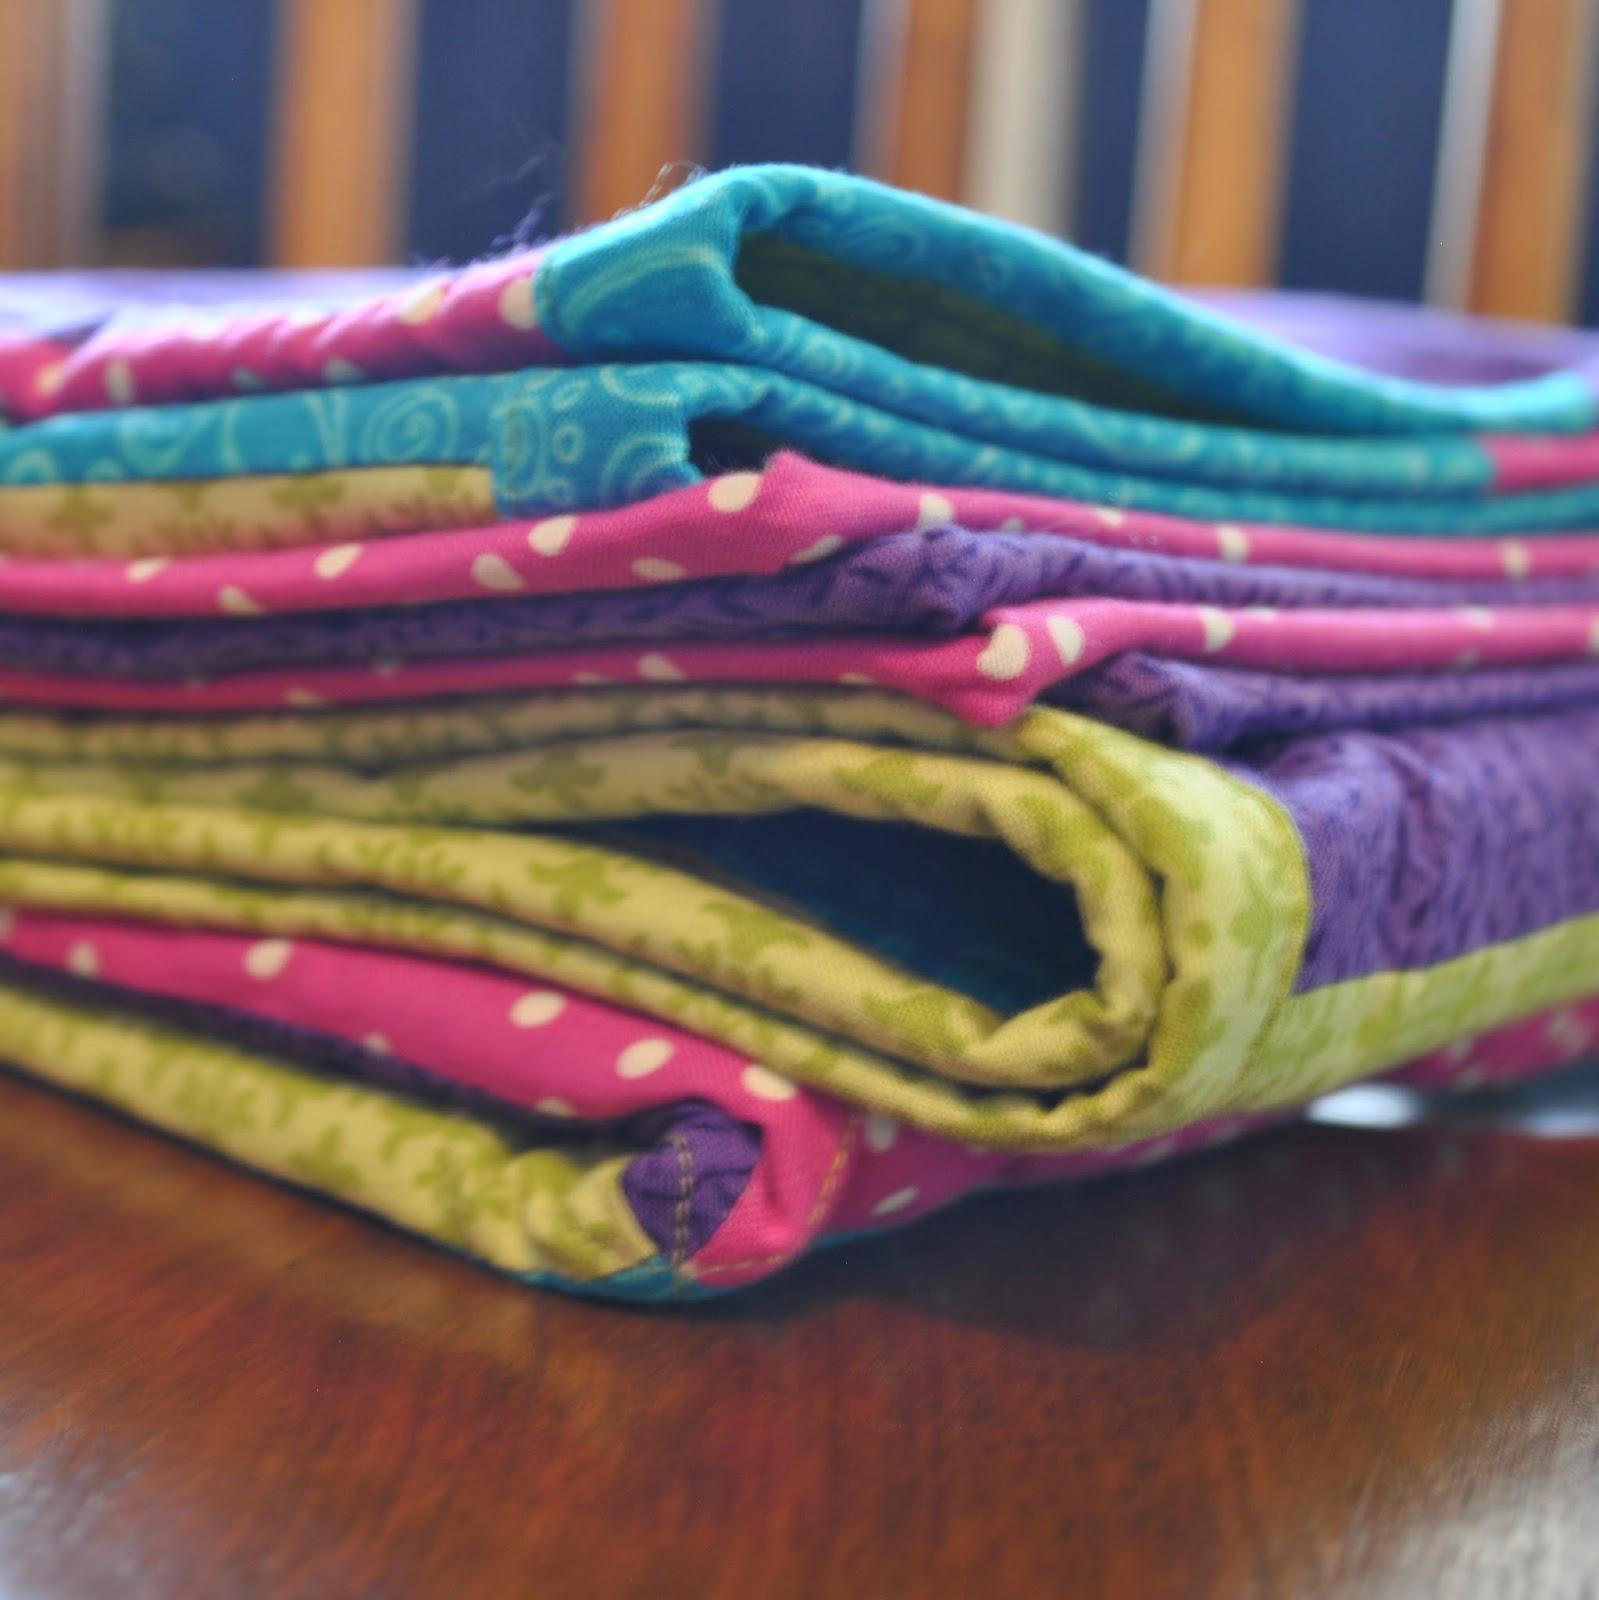 Ryley's Quilt